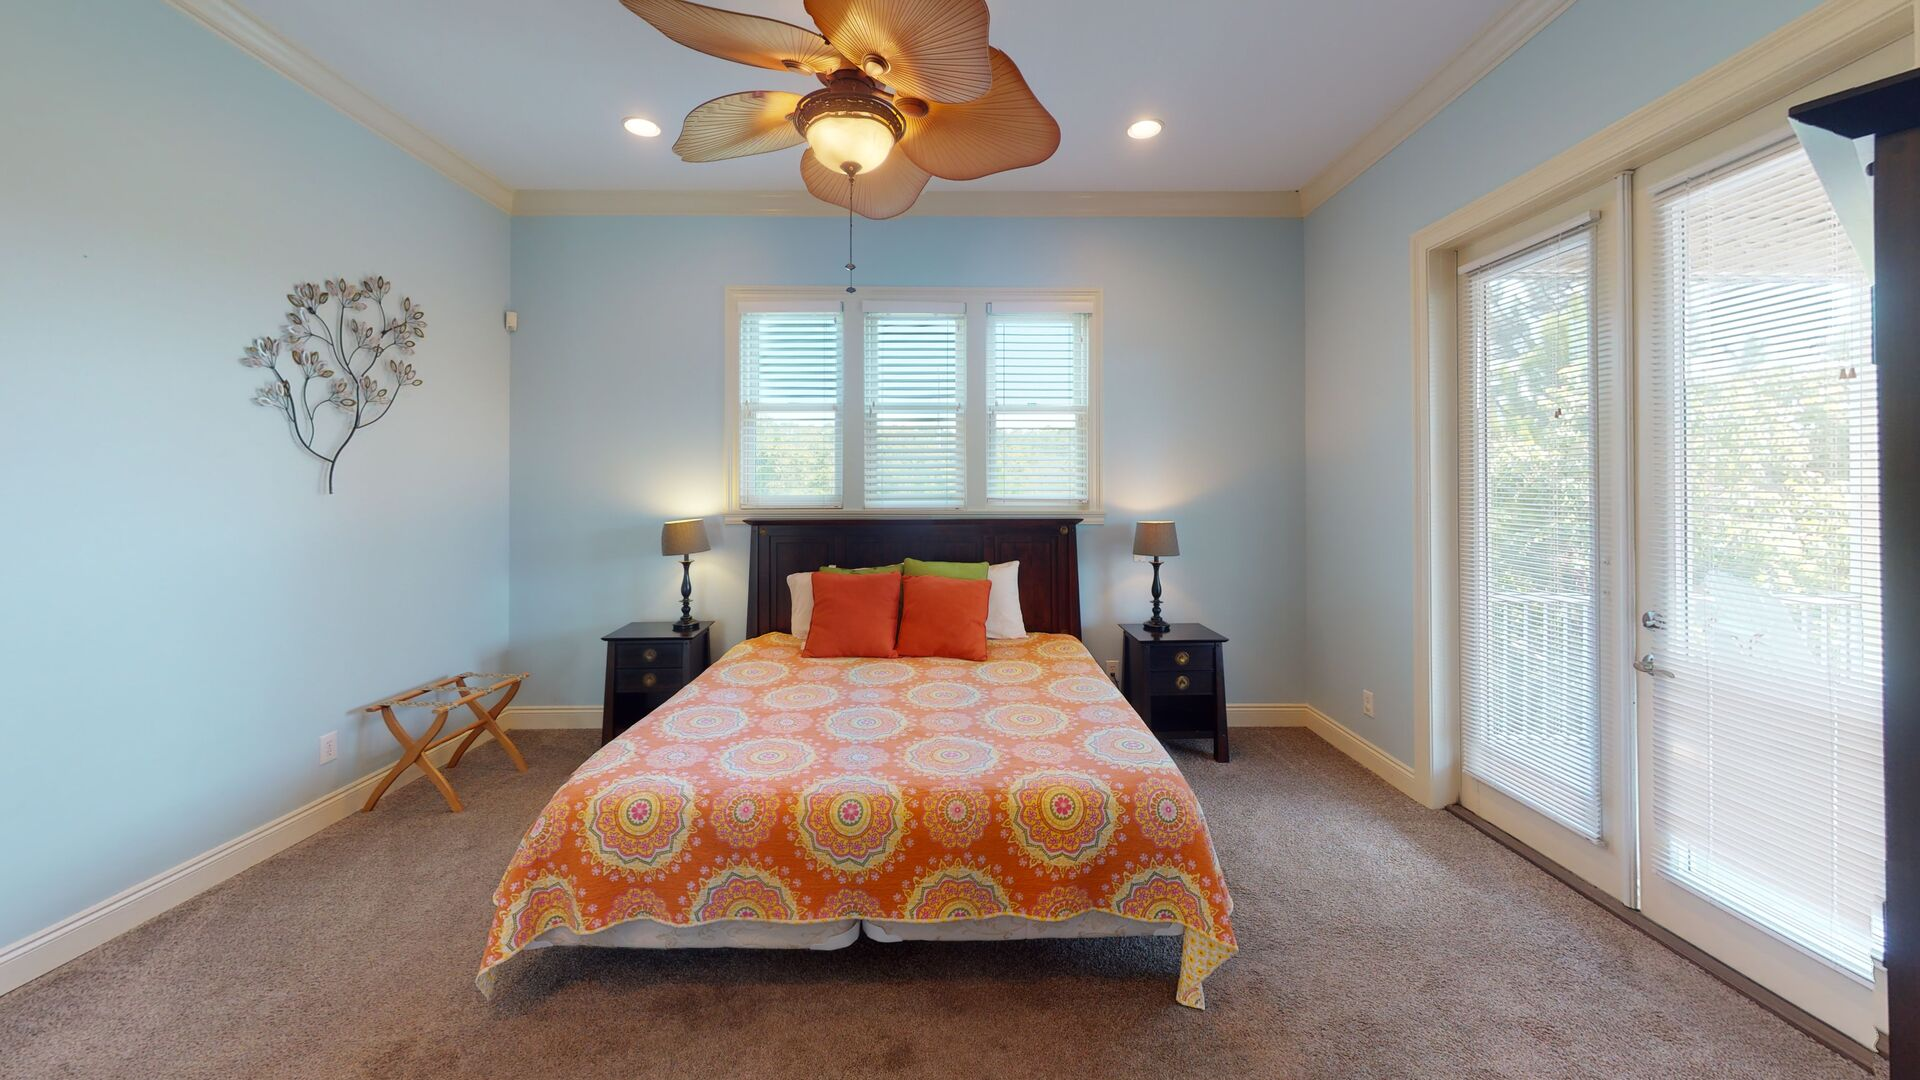 2nd floor master bedroom has a king bed